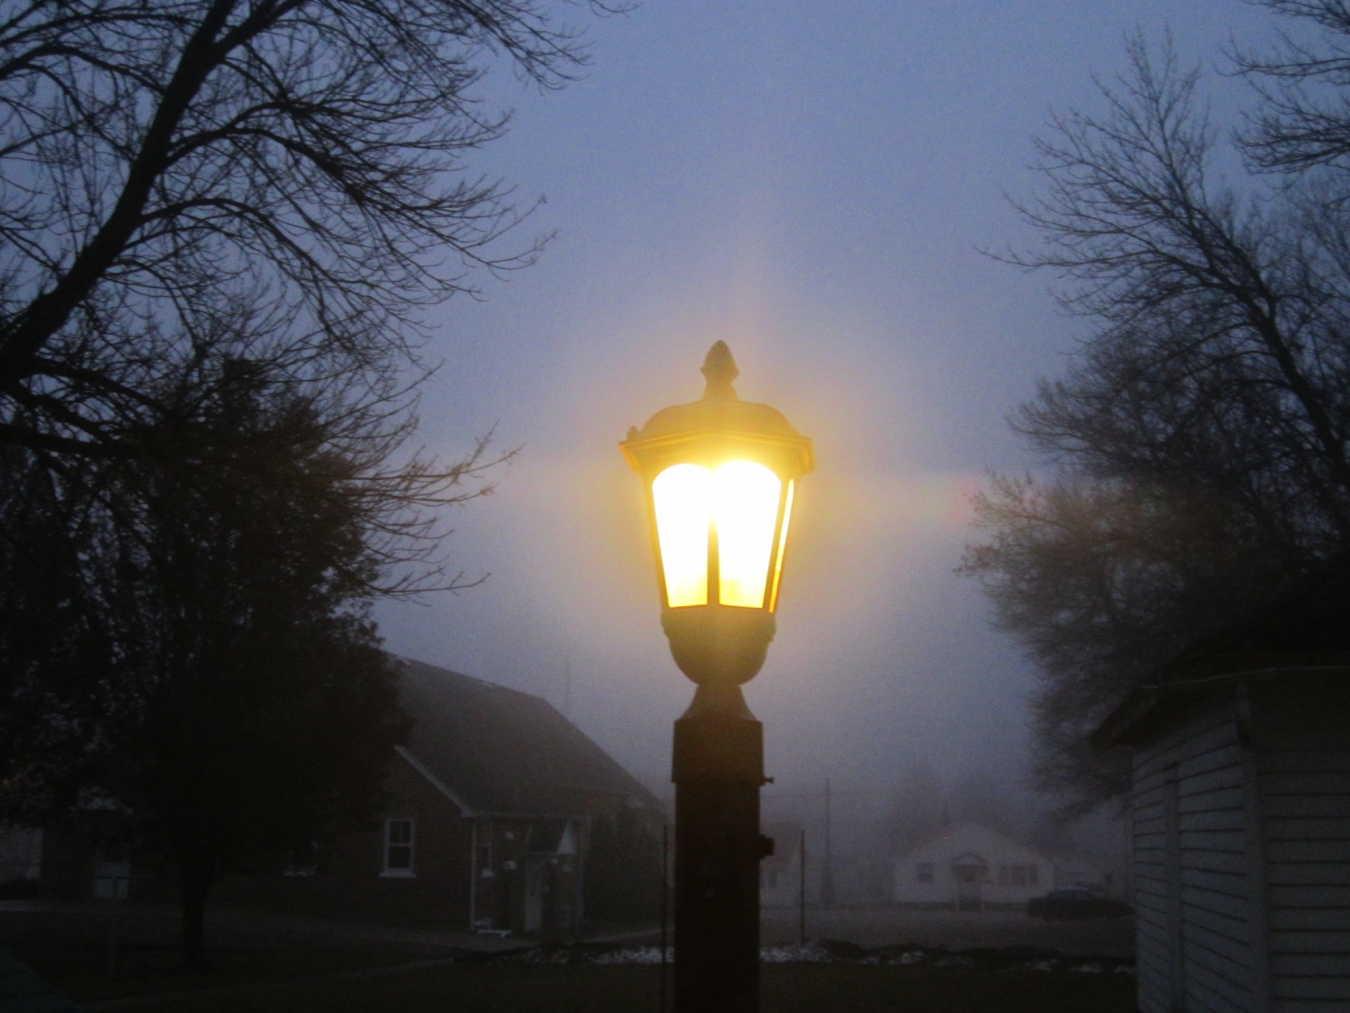 Oak Trees, Lamp-Posts, and Joy – Isaiah 61:1-4, 8-11 Advent Sermon